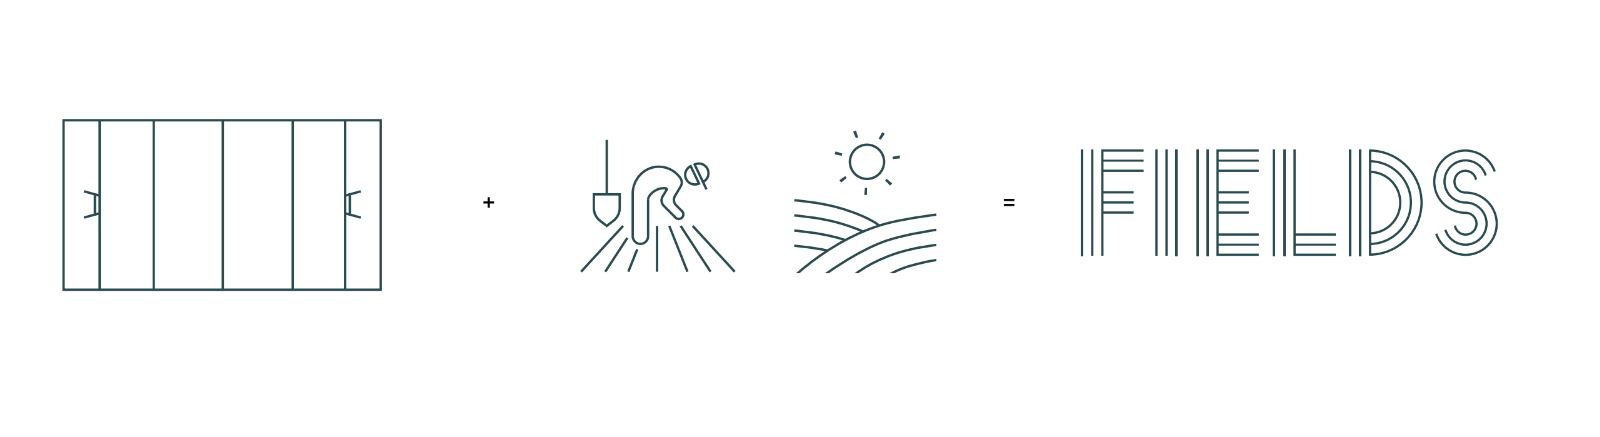 Fields Cafe Equation